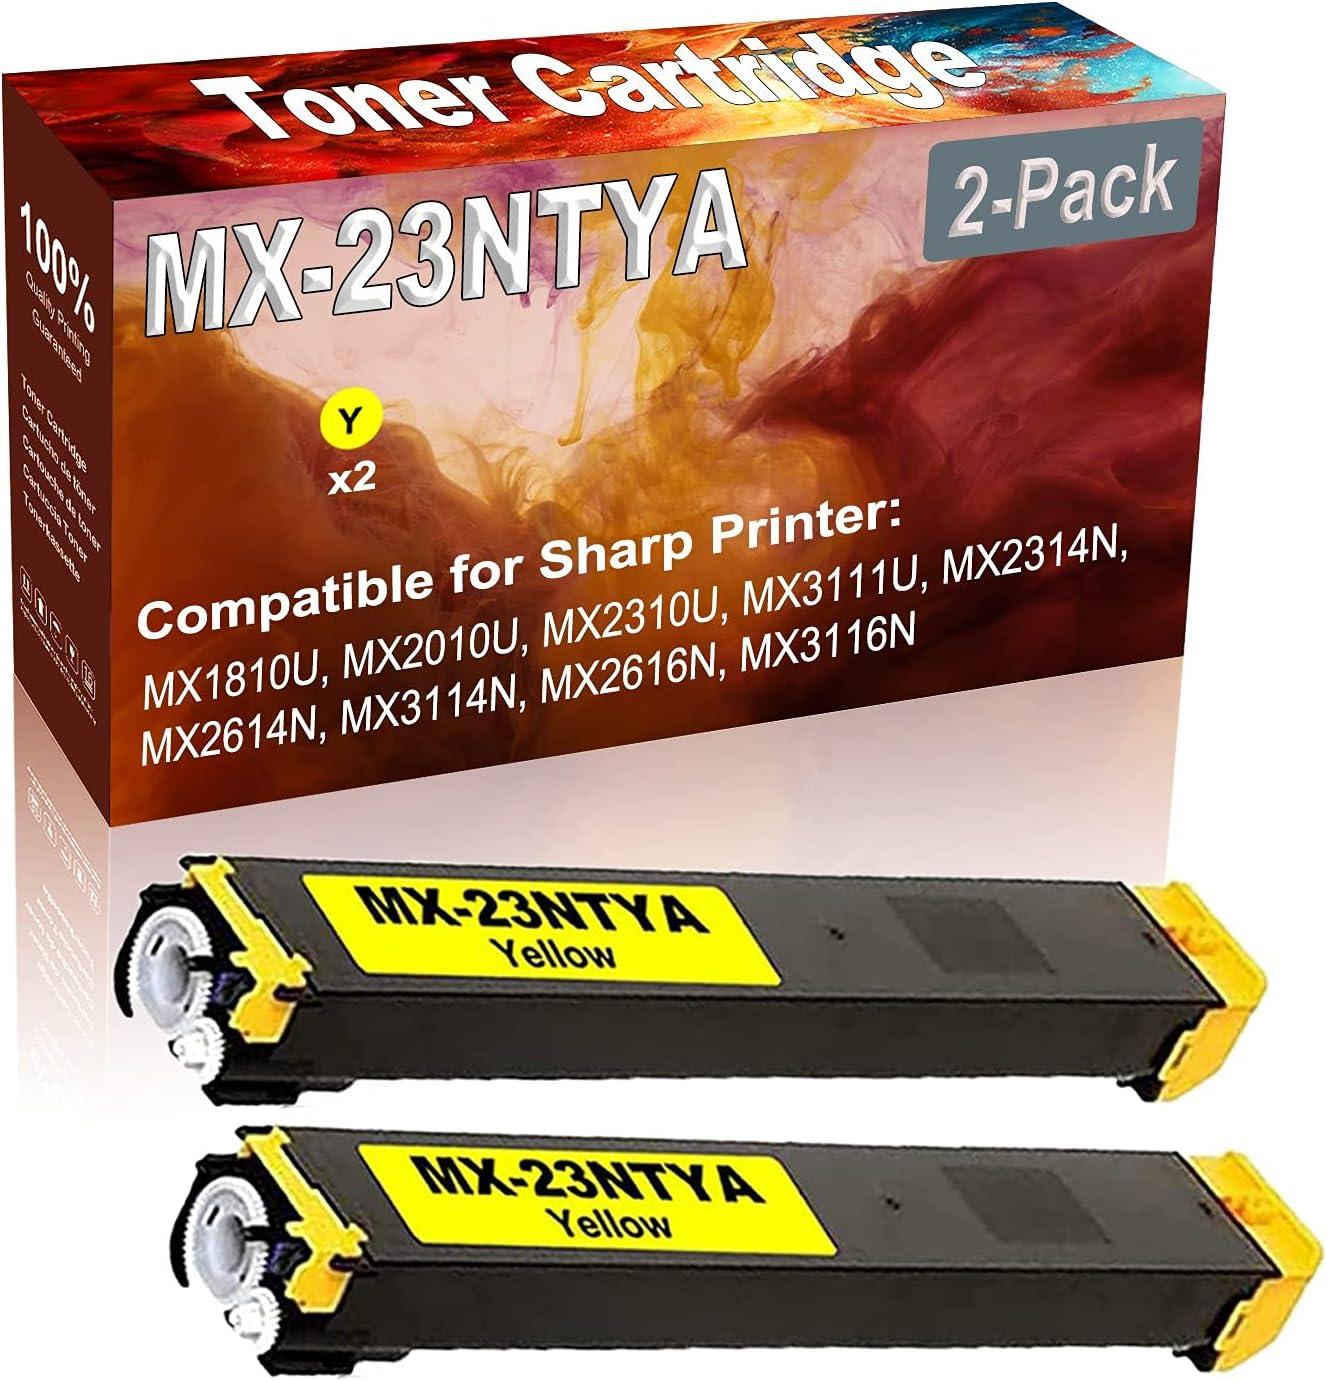 2-Pack (Yellow) Compatible MX1810U MX2010U MX2310U Laser Toner Cartridge (High Capacity) Replacement for Sharp MX-23NTYA Printer Toner Cartridge